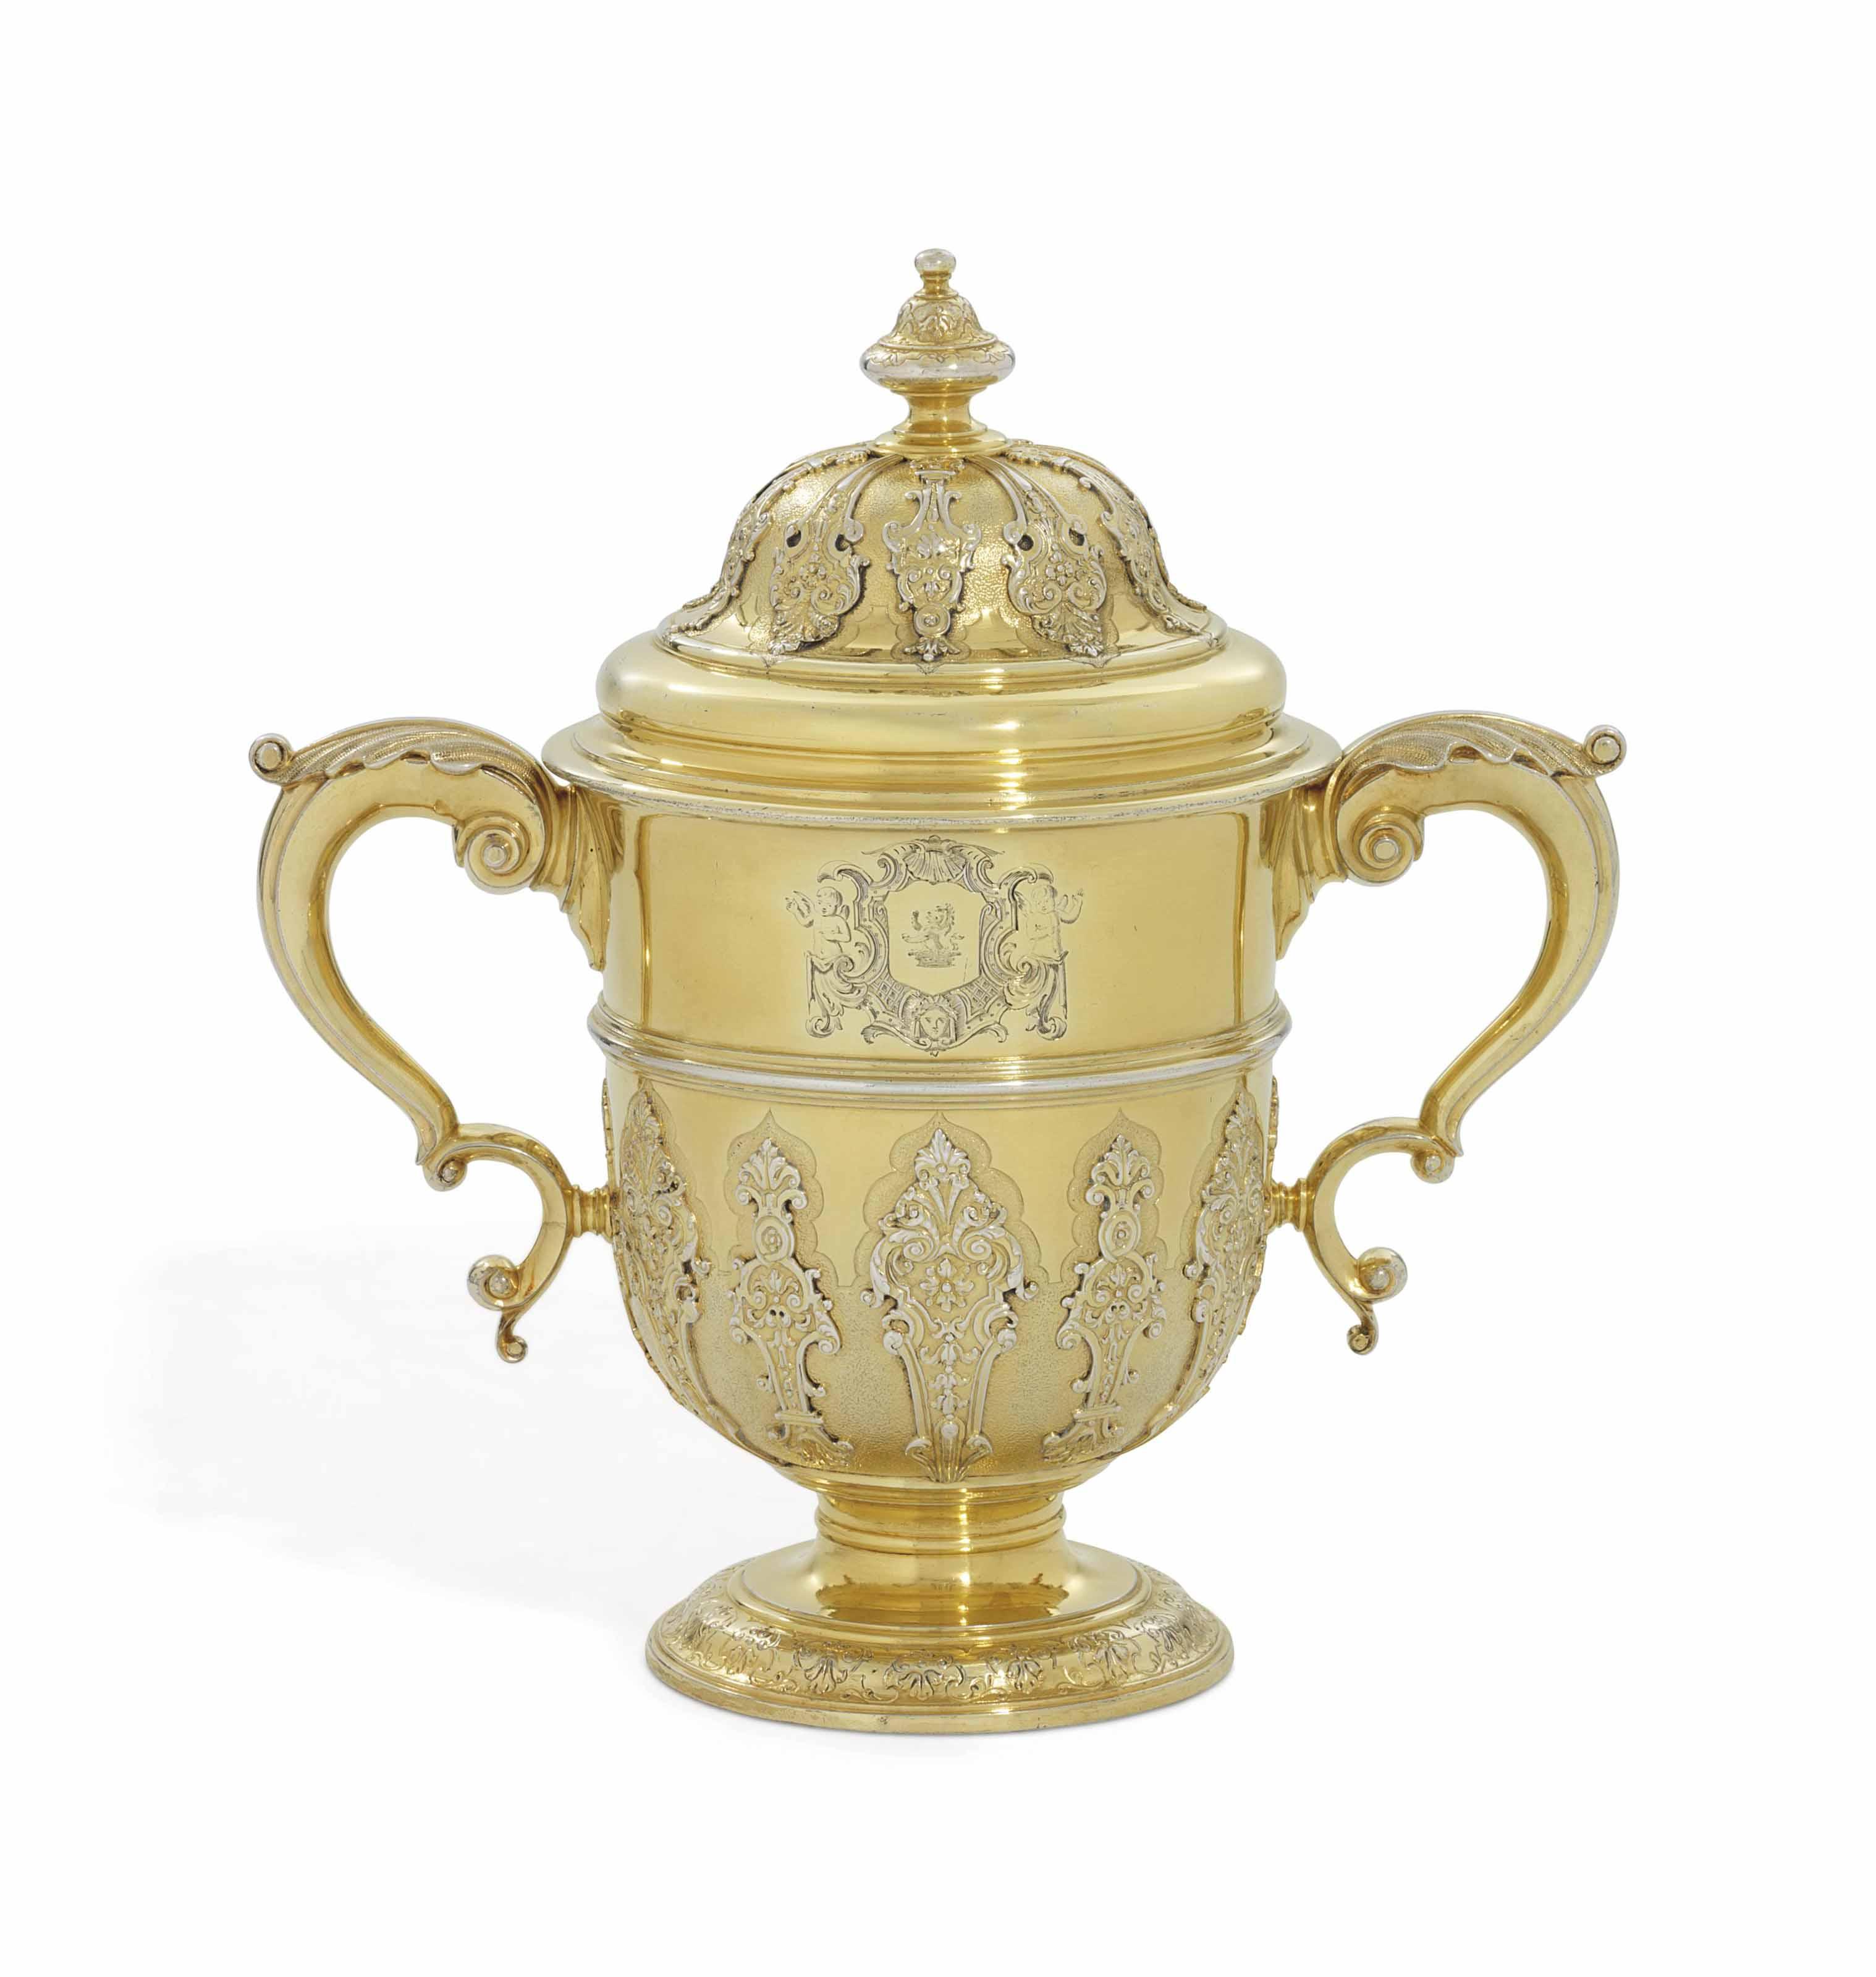 A GEORGE II SILVER-GILT CUP AN